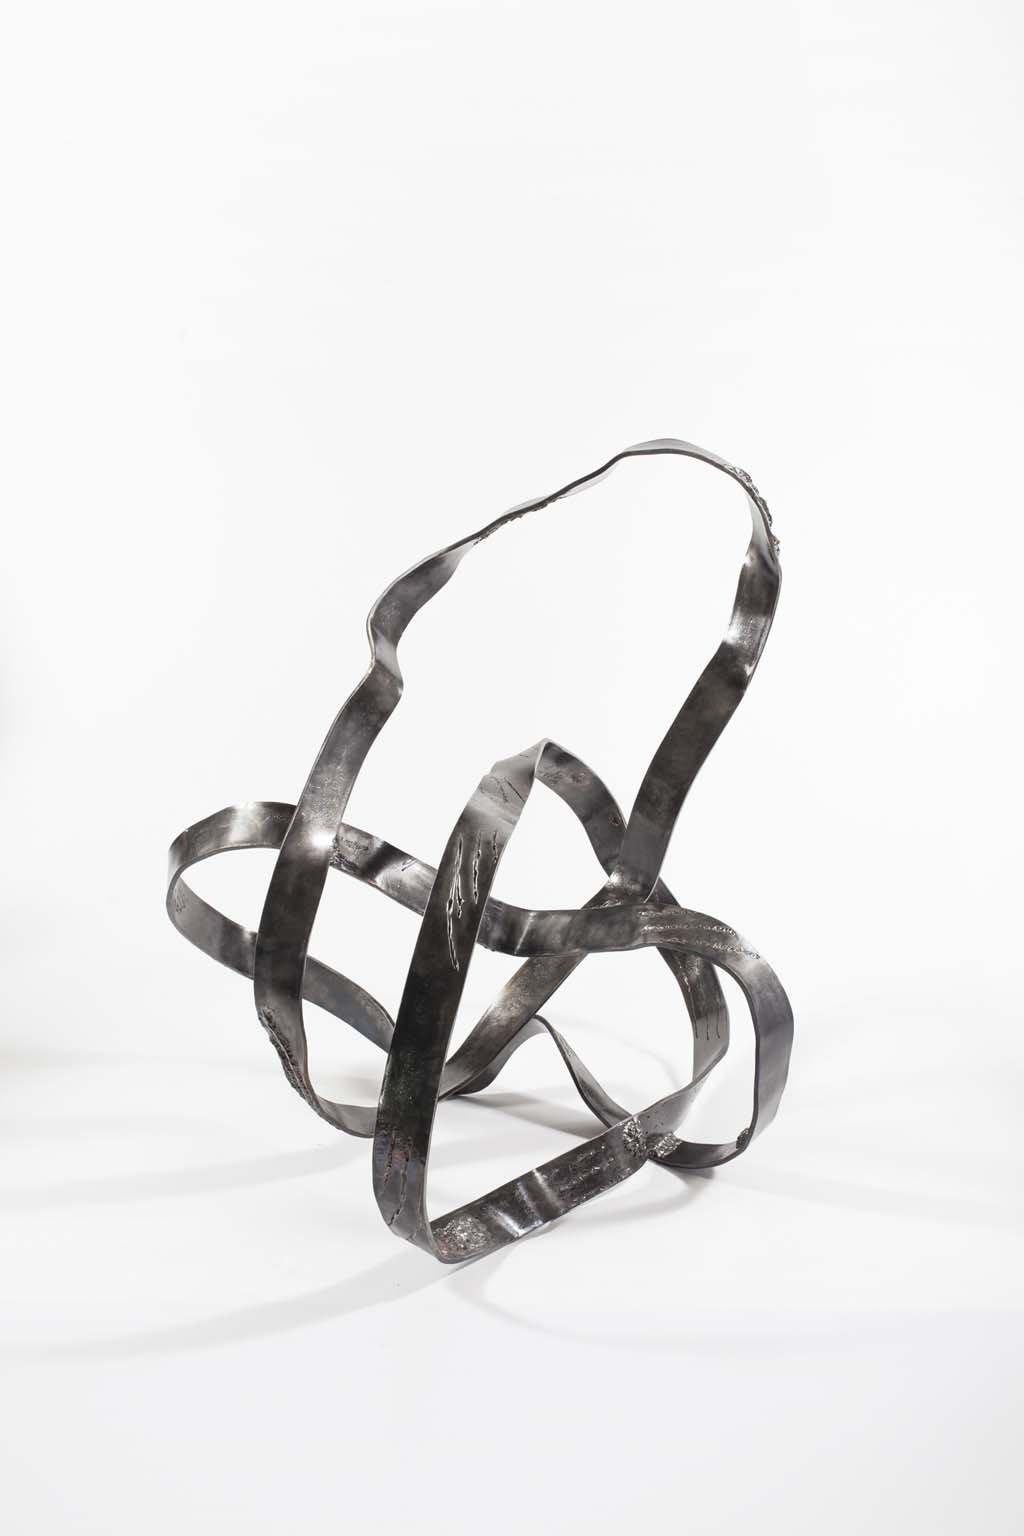 Oblivion III | 2016 | Iron & brass Sculpture| 80x120x70 cm | Rami Ater